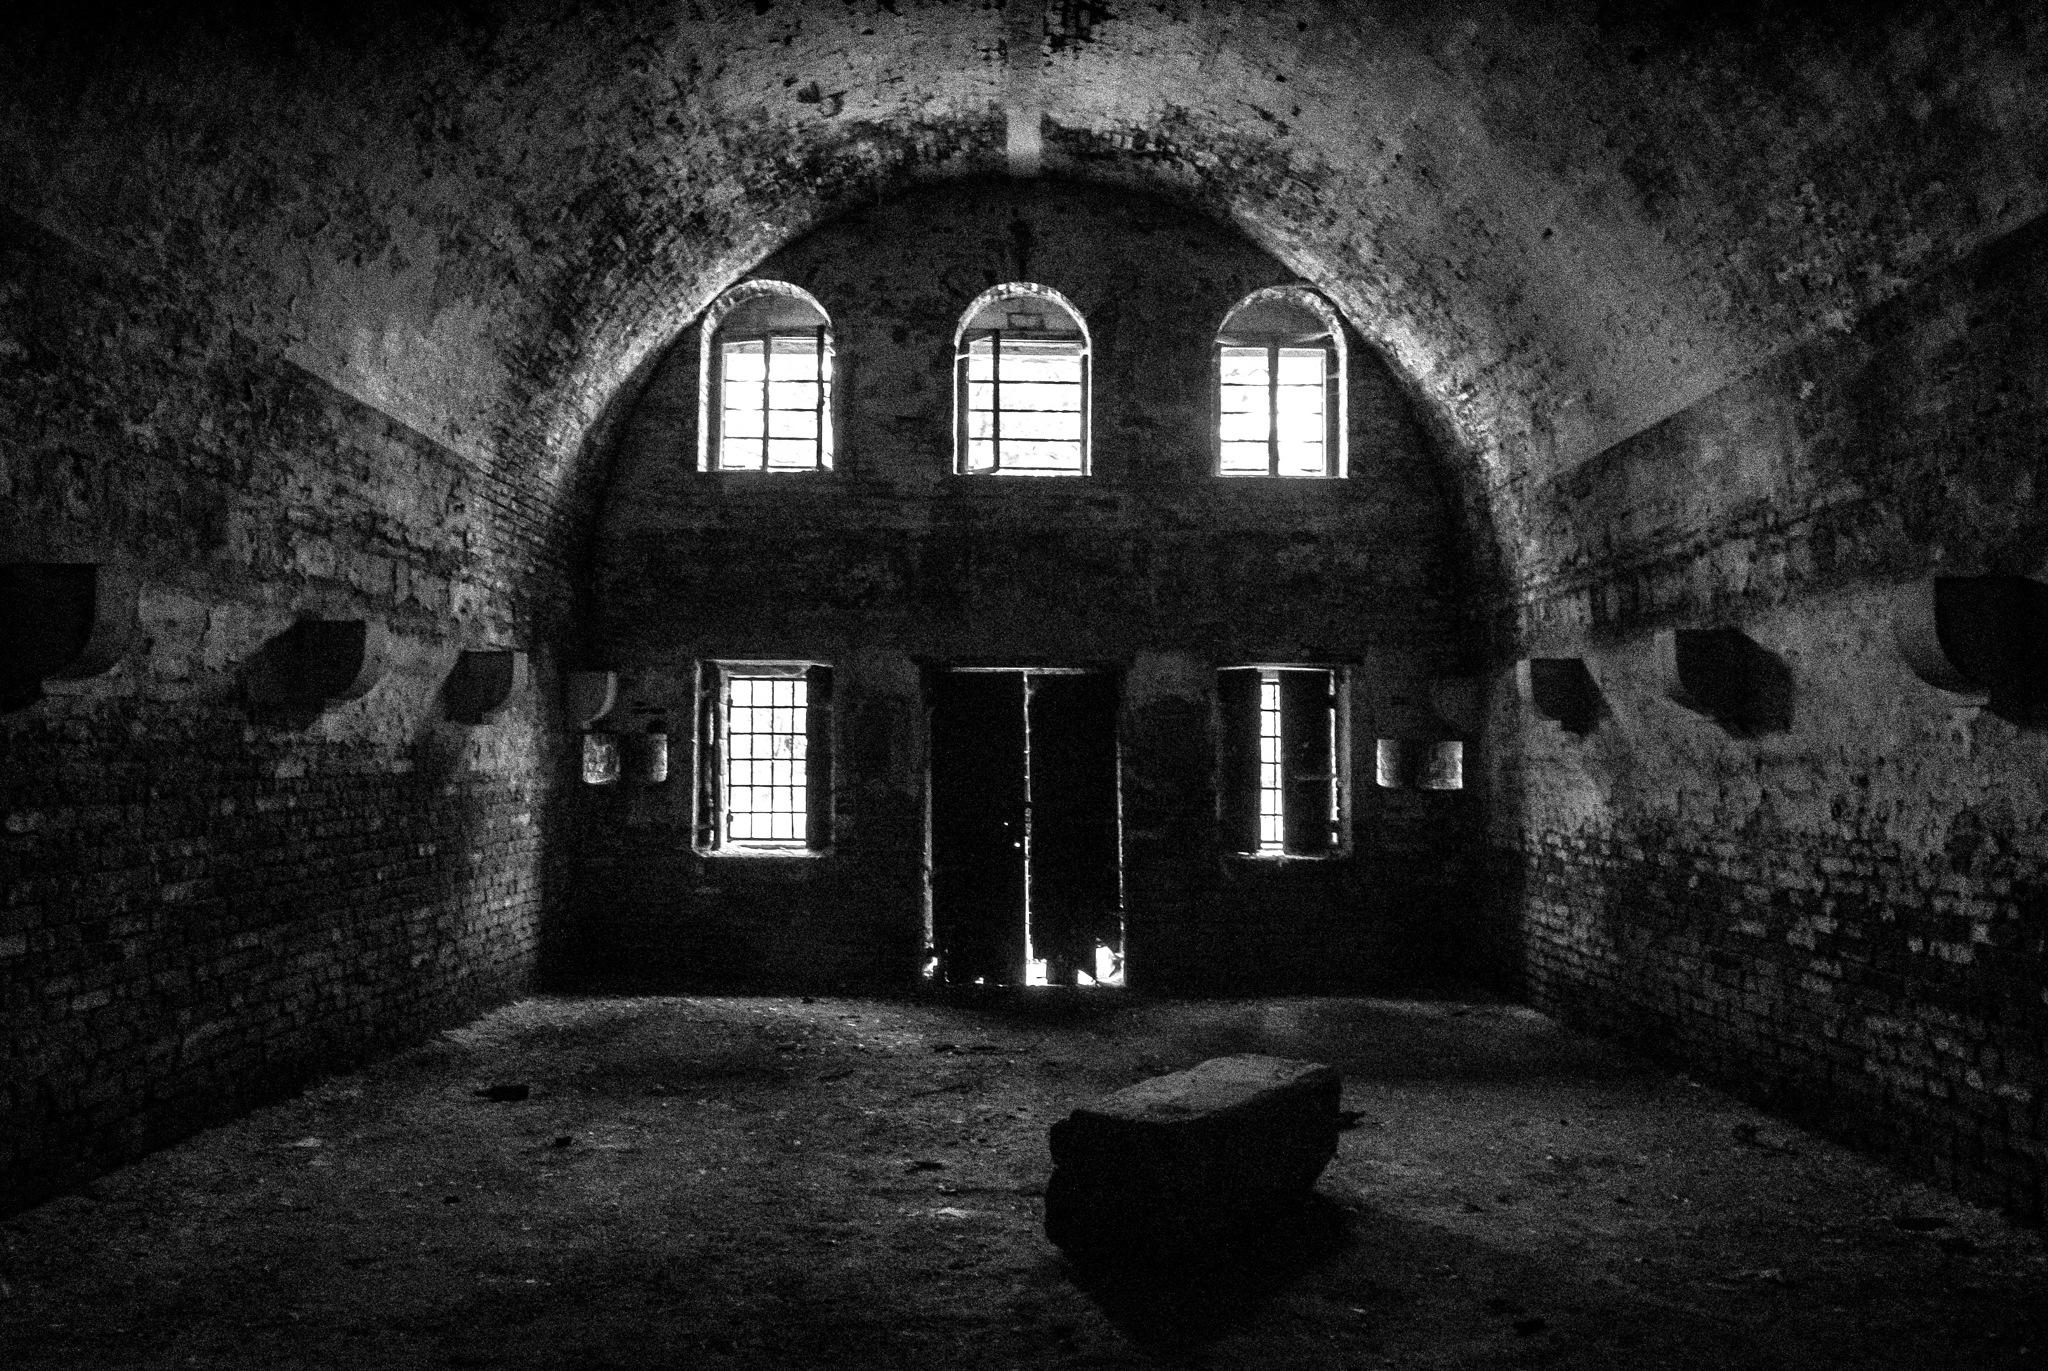 Barracks by Matteo Cargasacchi